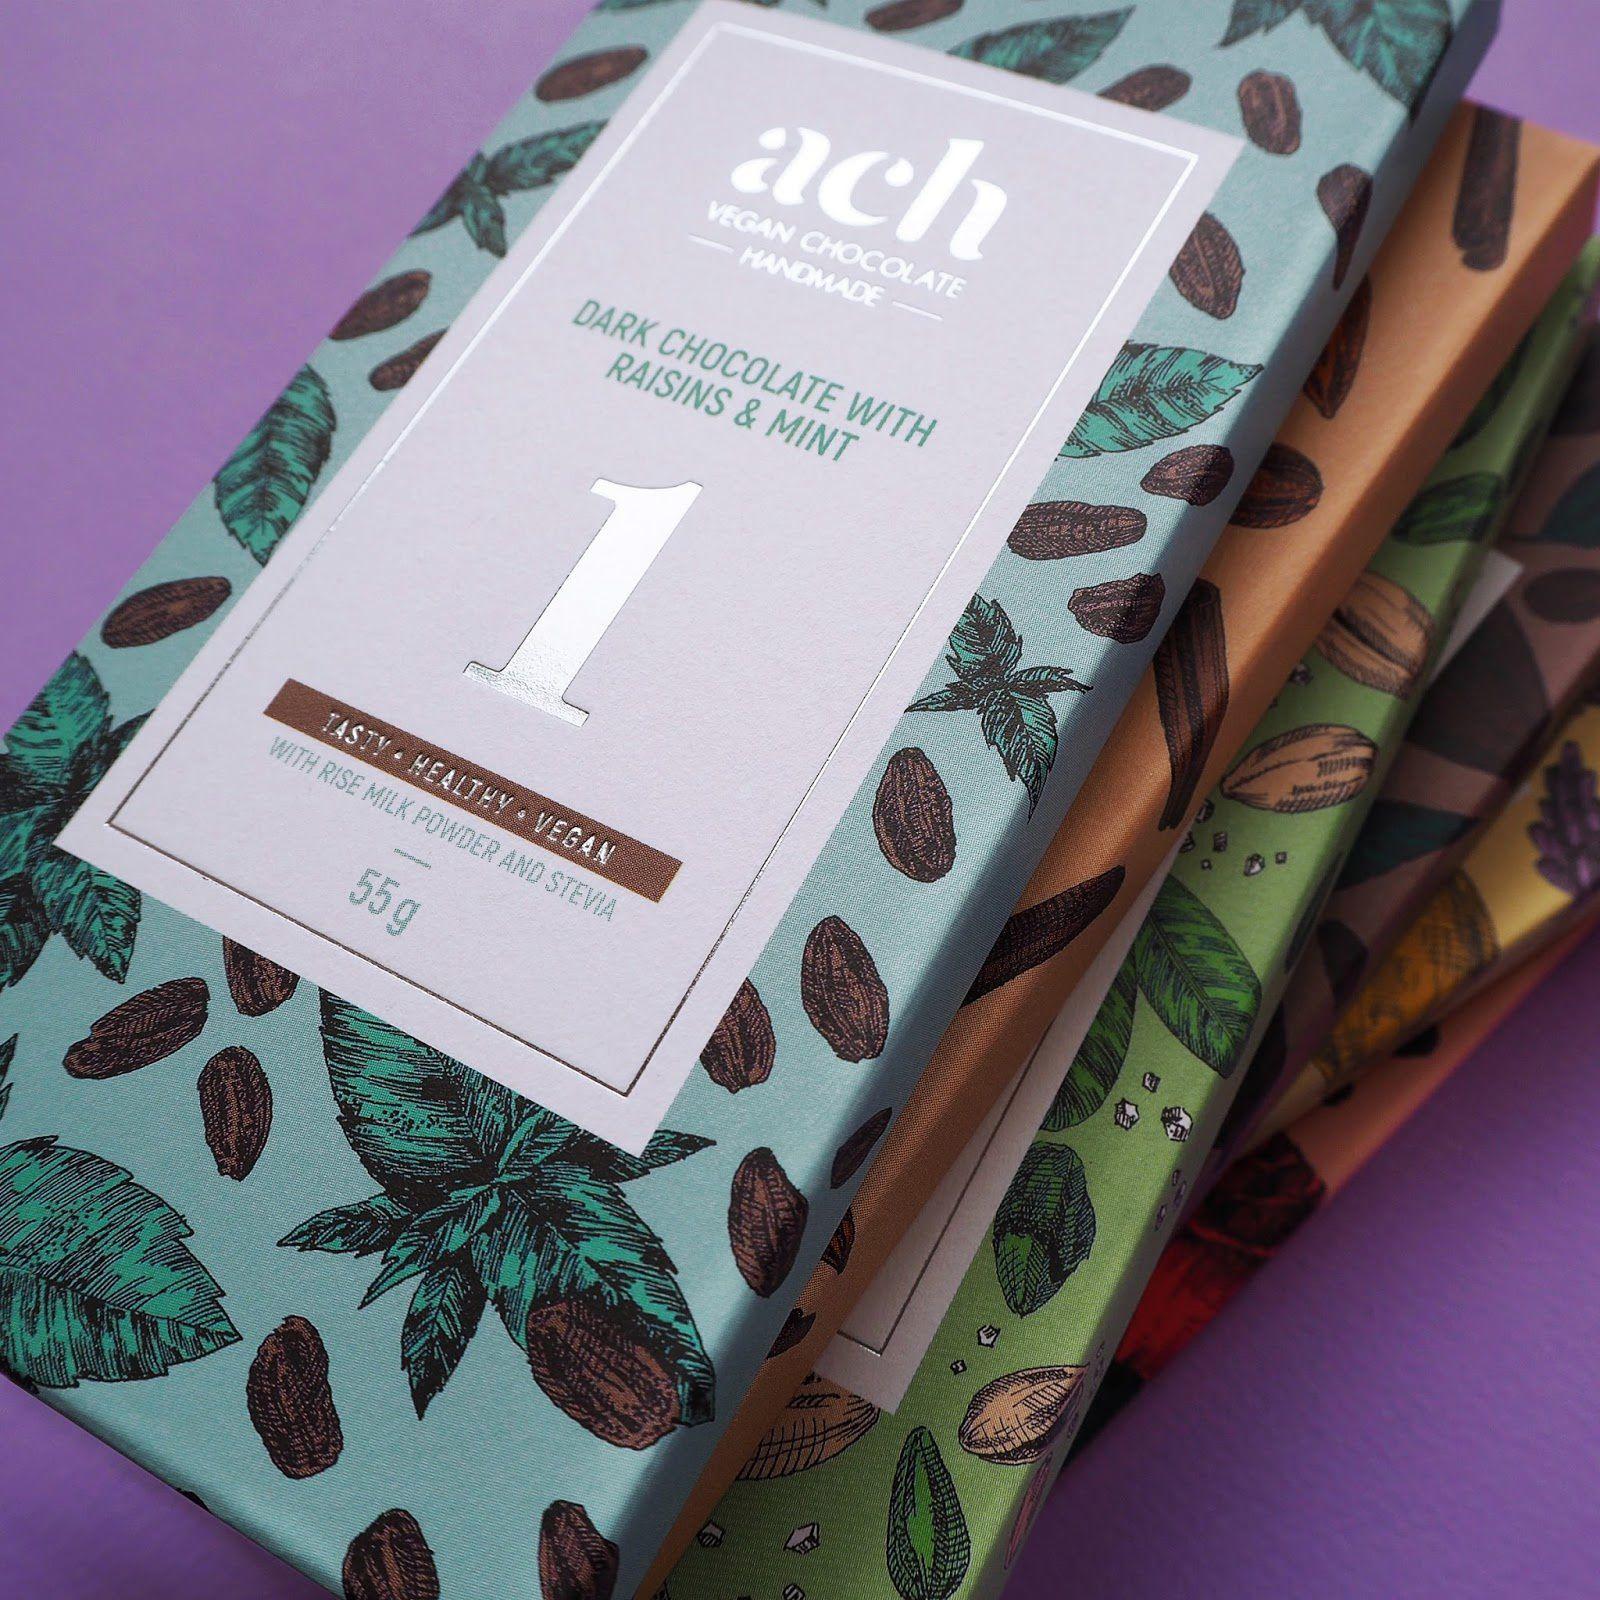 ACH vegan chocolate (chocolat vegan) I Design : Gintarė Marcinkevičienė, Vilnius, Lituanie (octobre 2017)